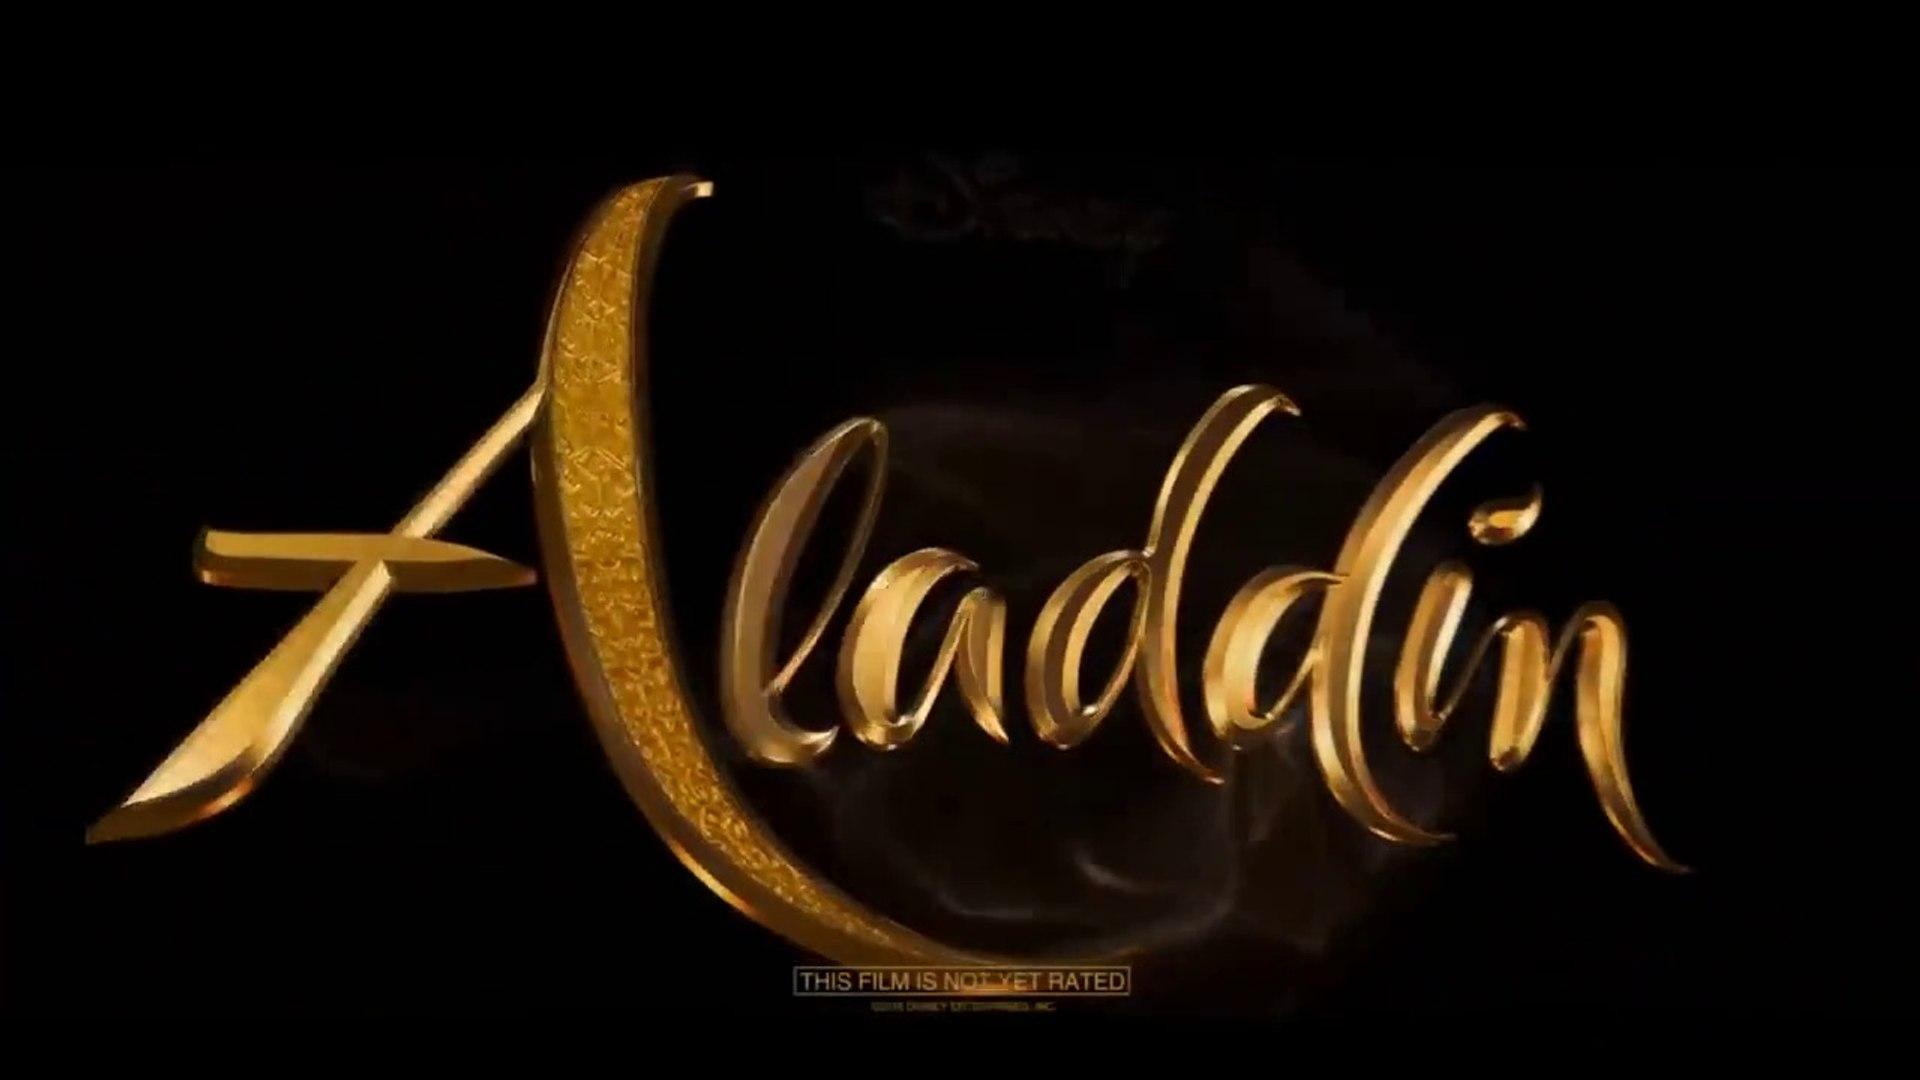 ALADDIN Official Trailer #2 [HD] Billy Magnussen, Will Smith, Naomi Scott